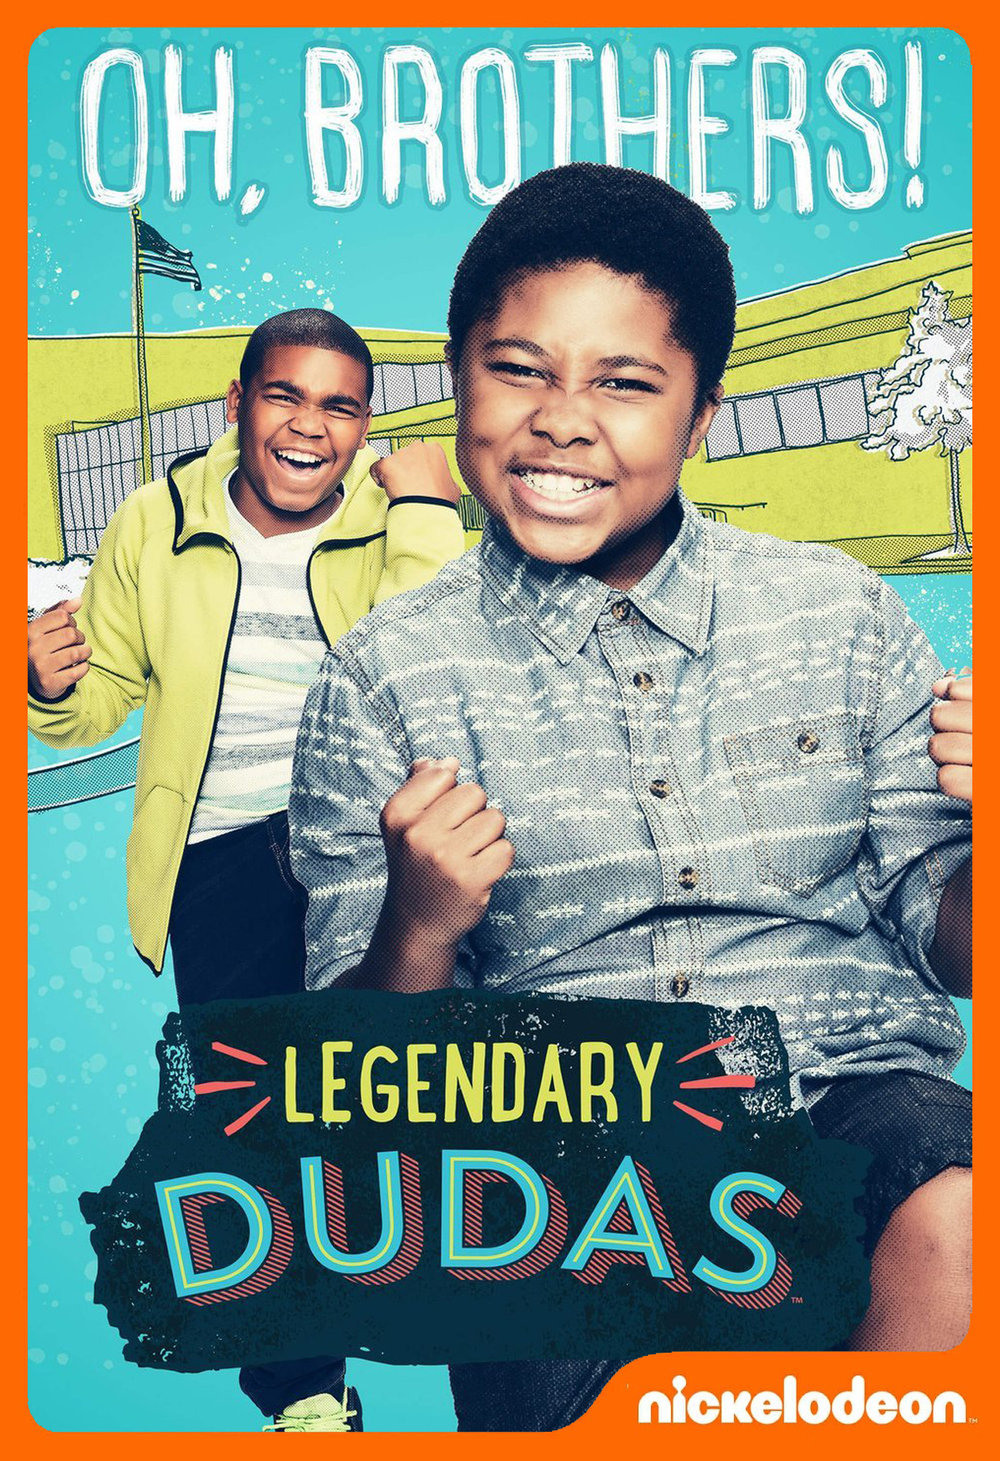 Legendary Dudas, Nickelodeon